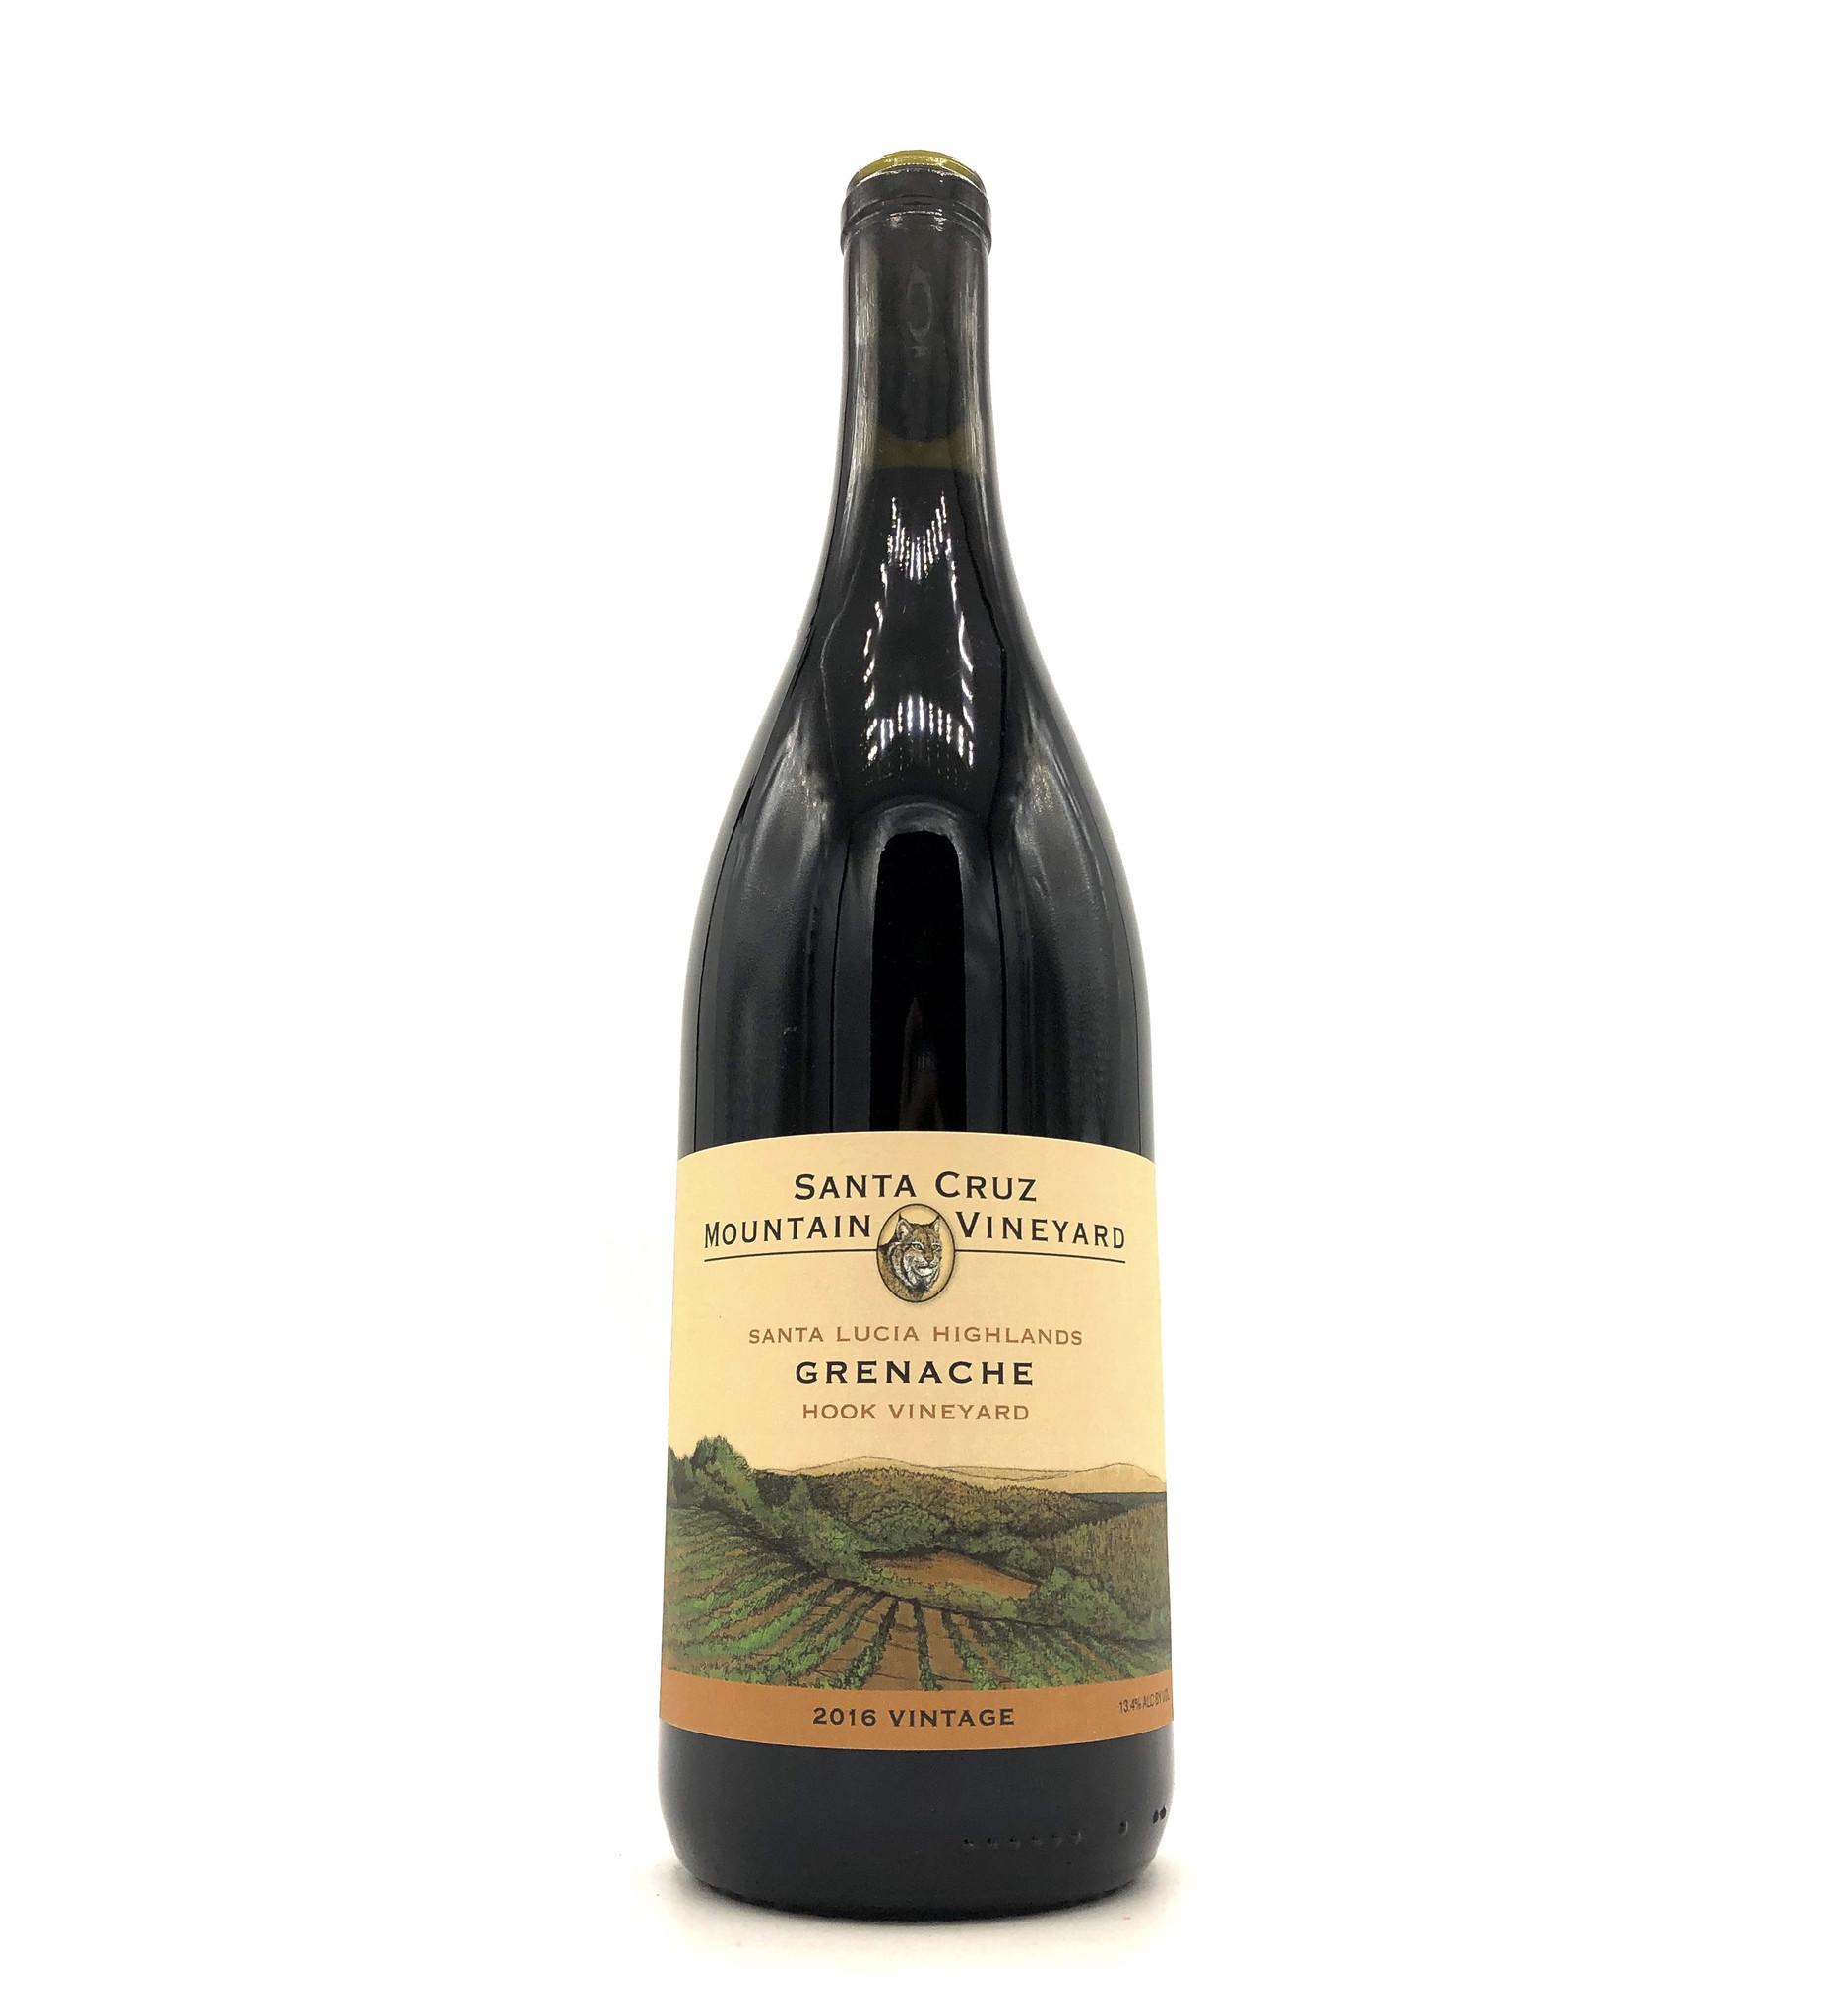 Grenache Hook 2017 Santa Cruz Mountain Vineyards